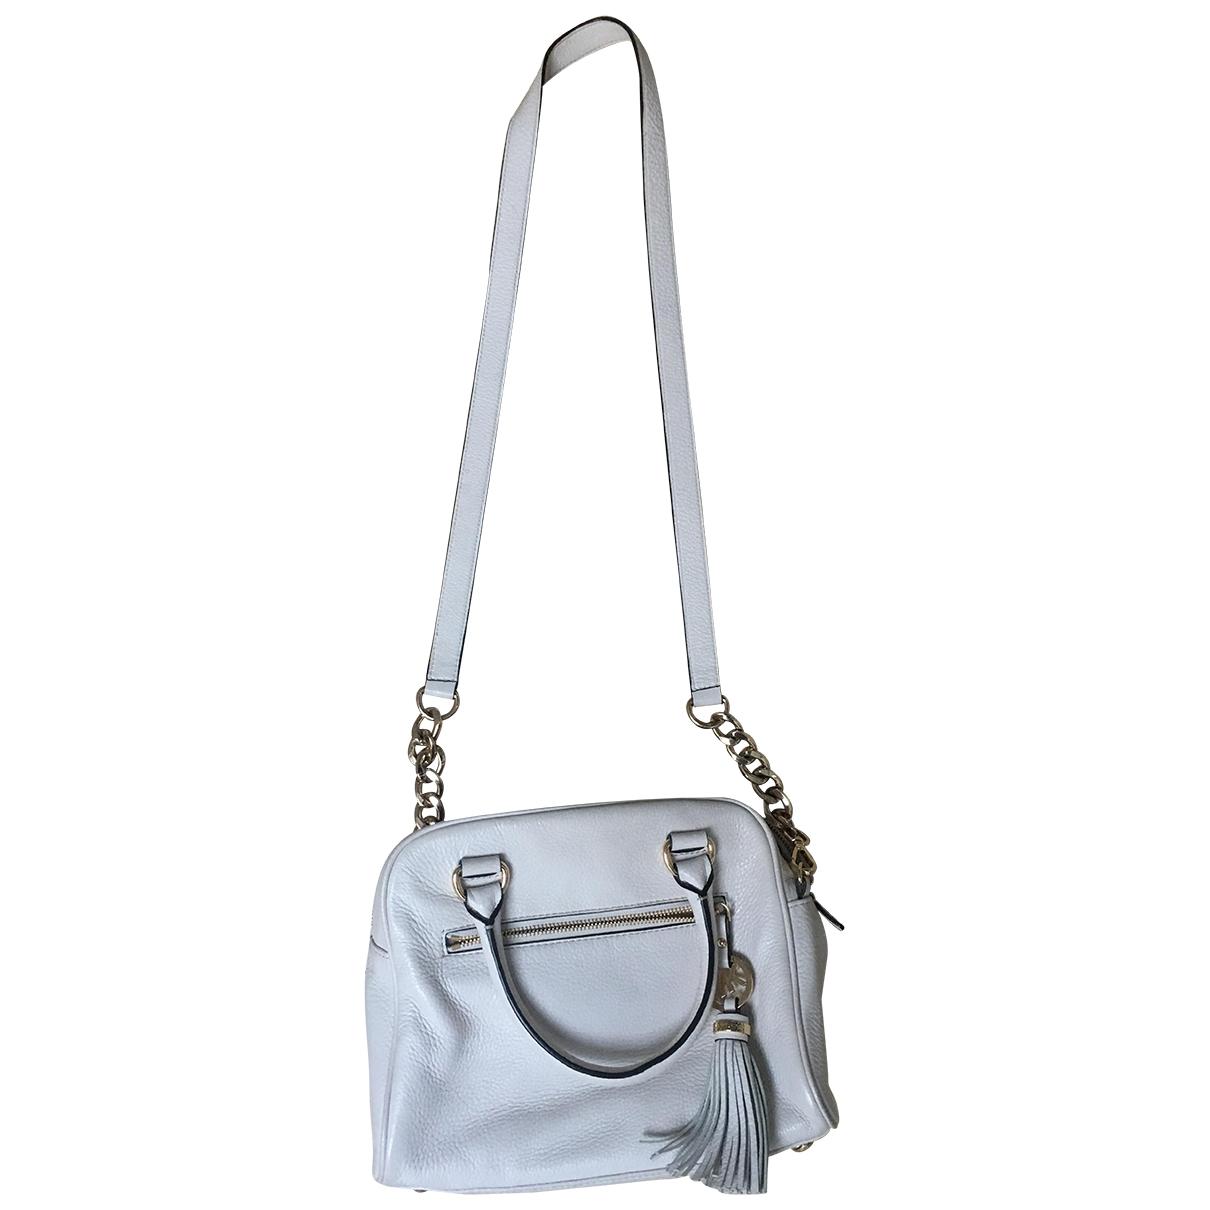 Michael Kors \N Ecru Leather handbag for Women \N